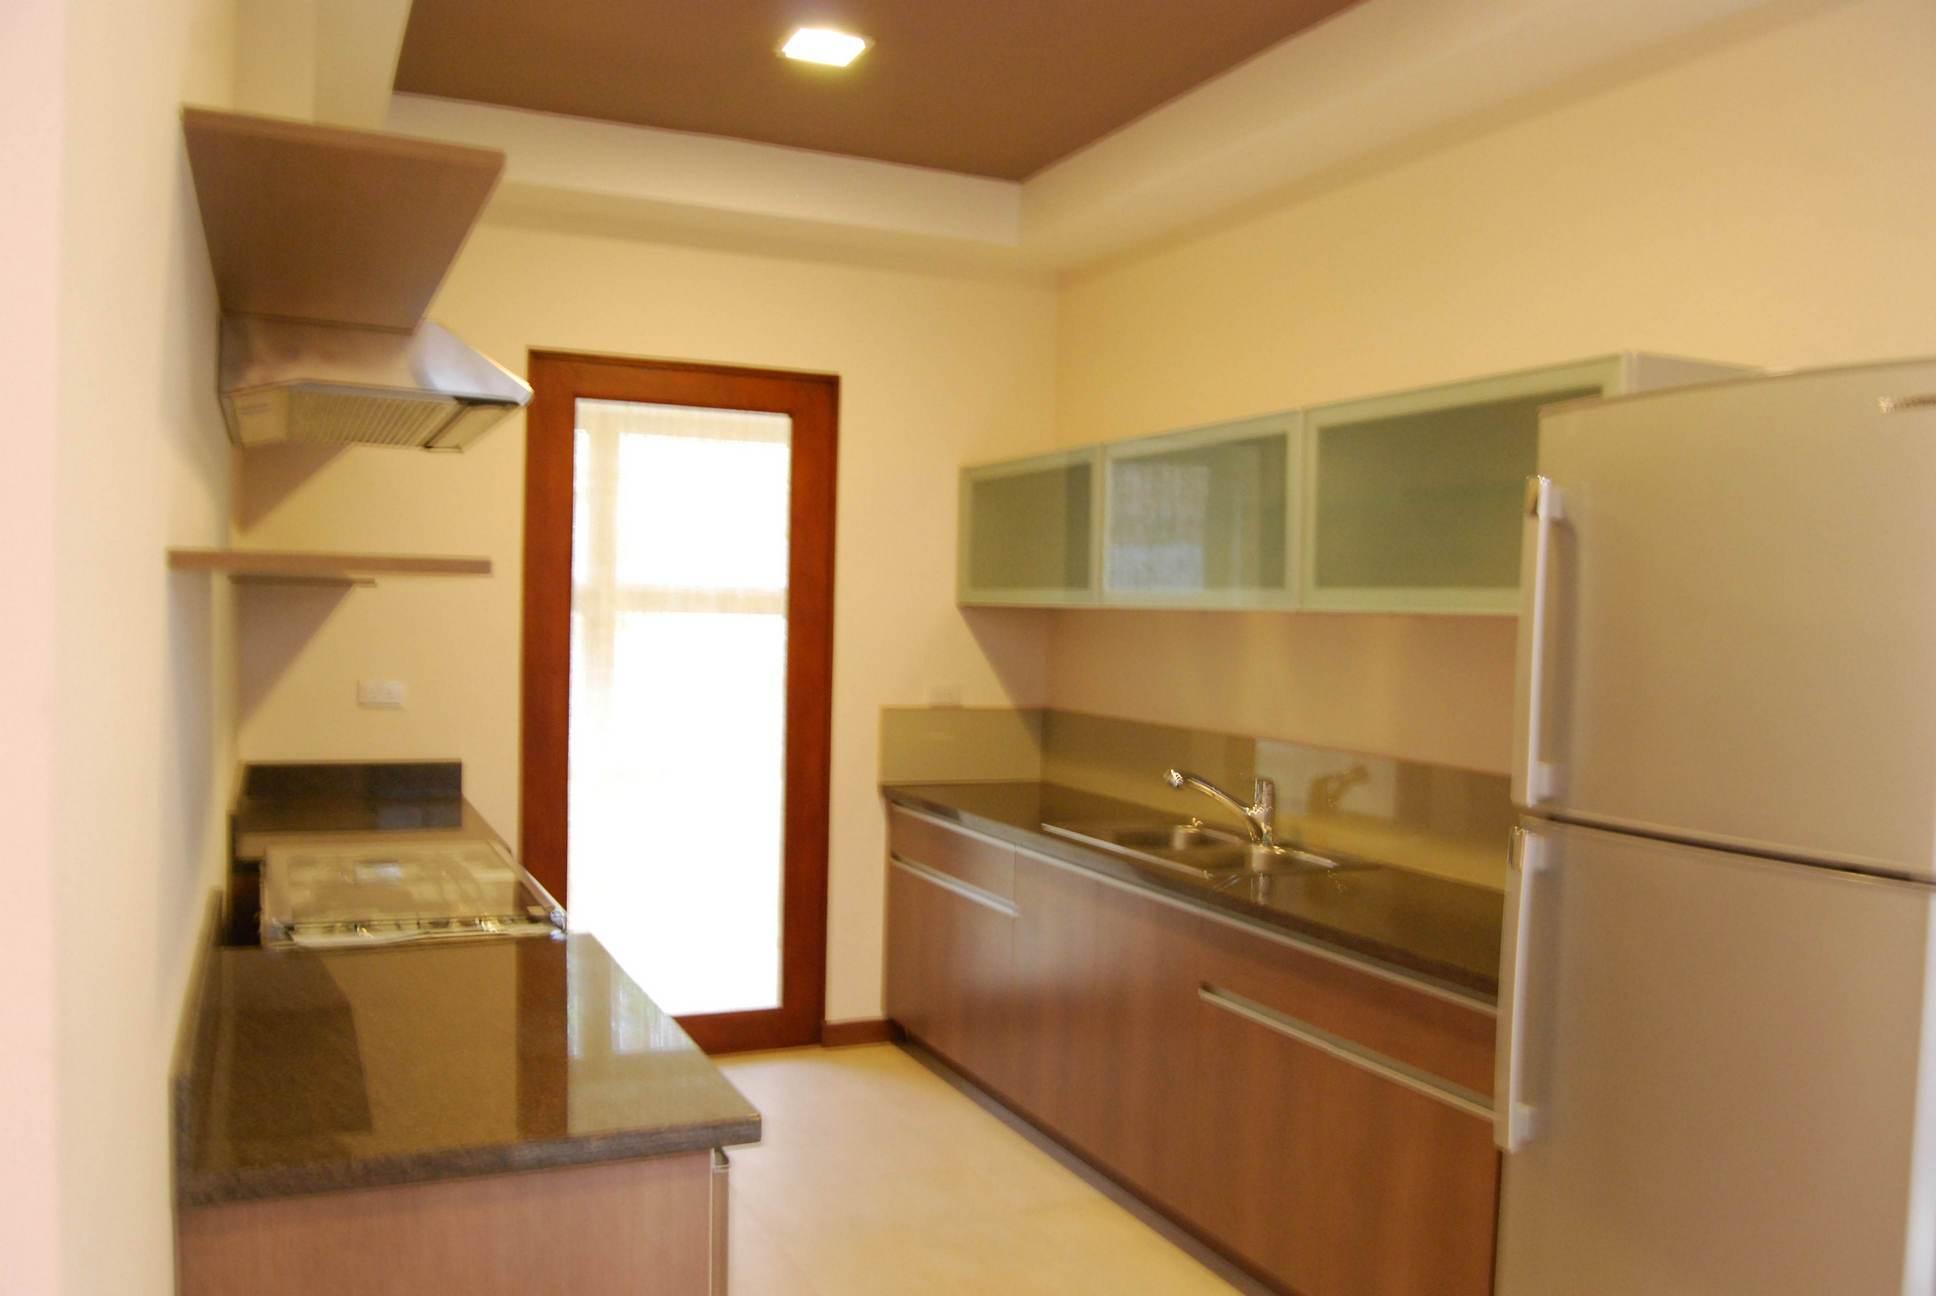 RH162 3 Bedroom House for Rent in Cebu City Banilad Cebu Grand Realty   3. House for Rent in Cebu City Banilad   Cebu Grand Realty